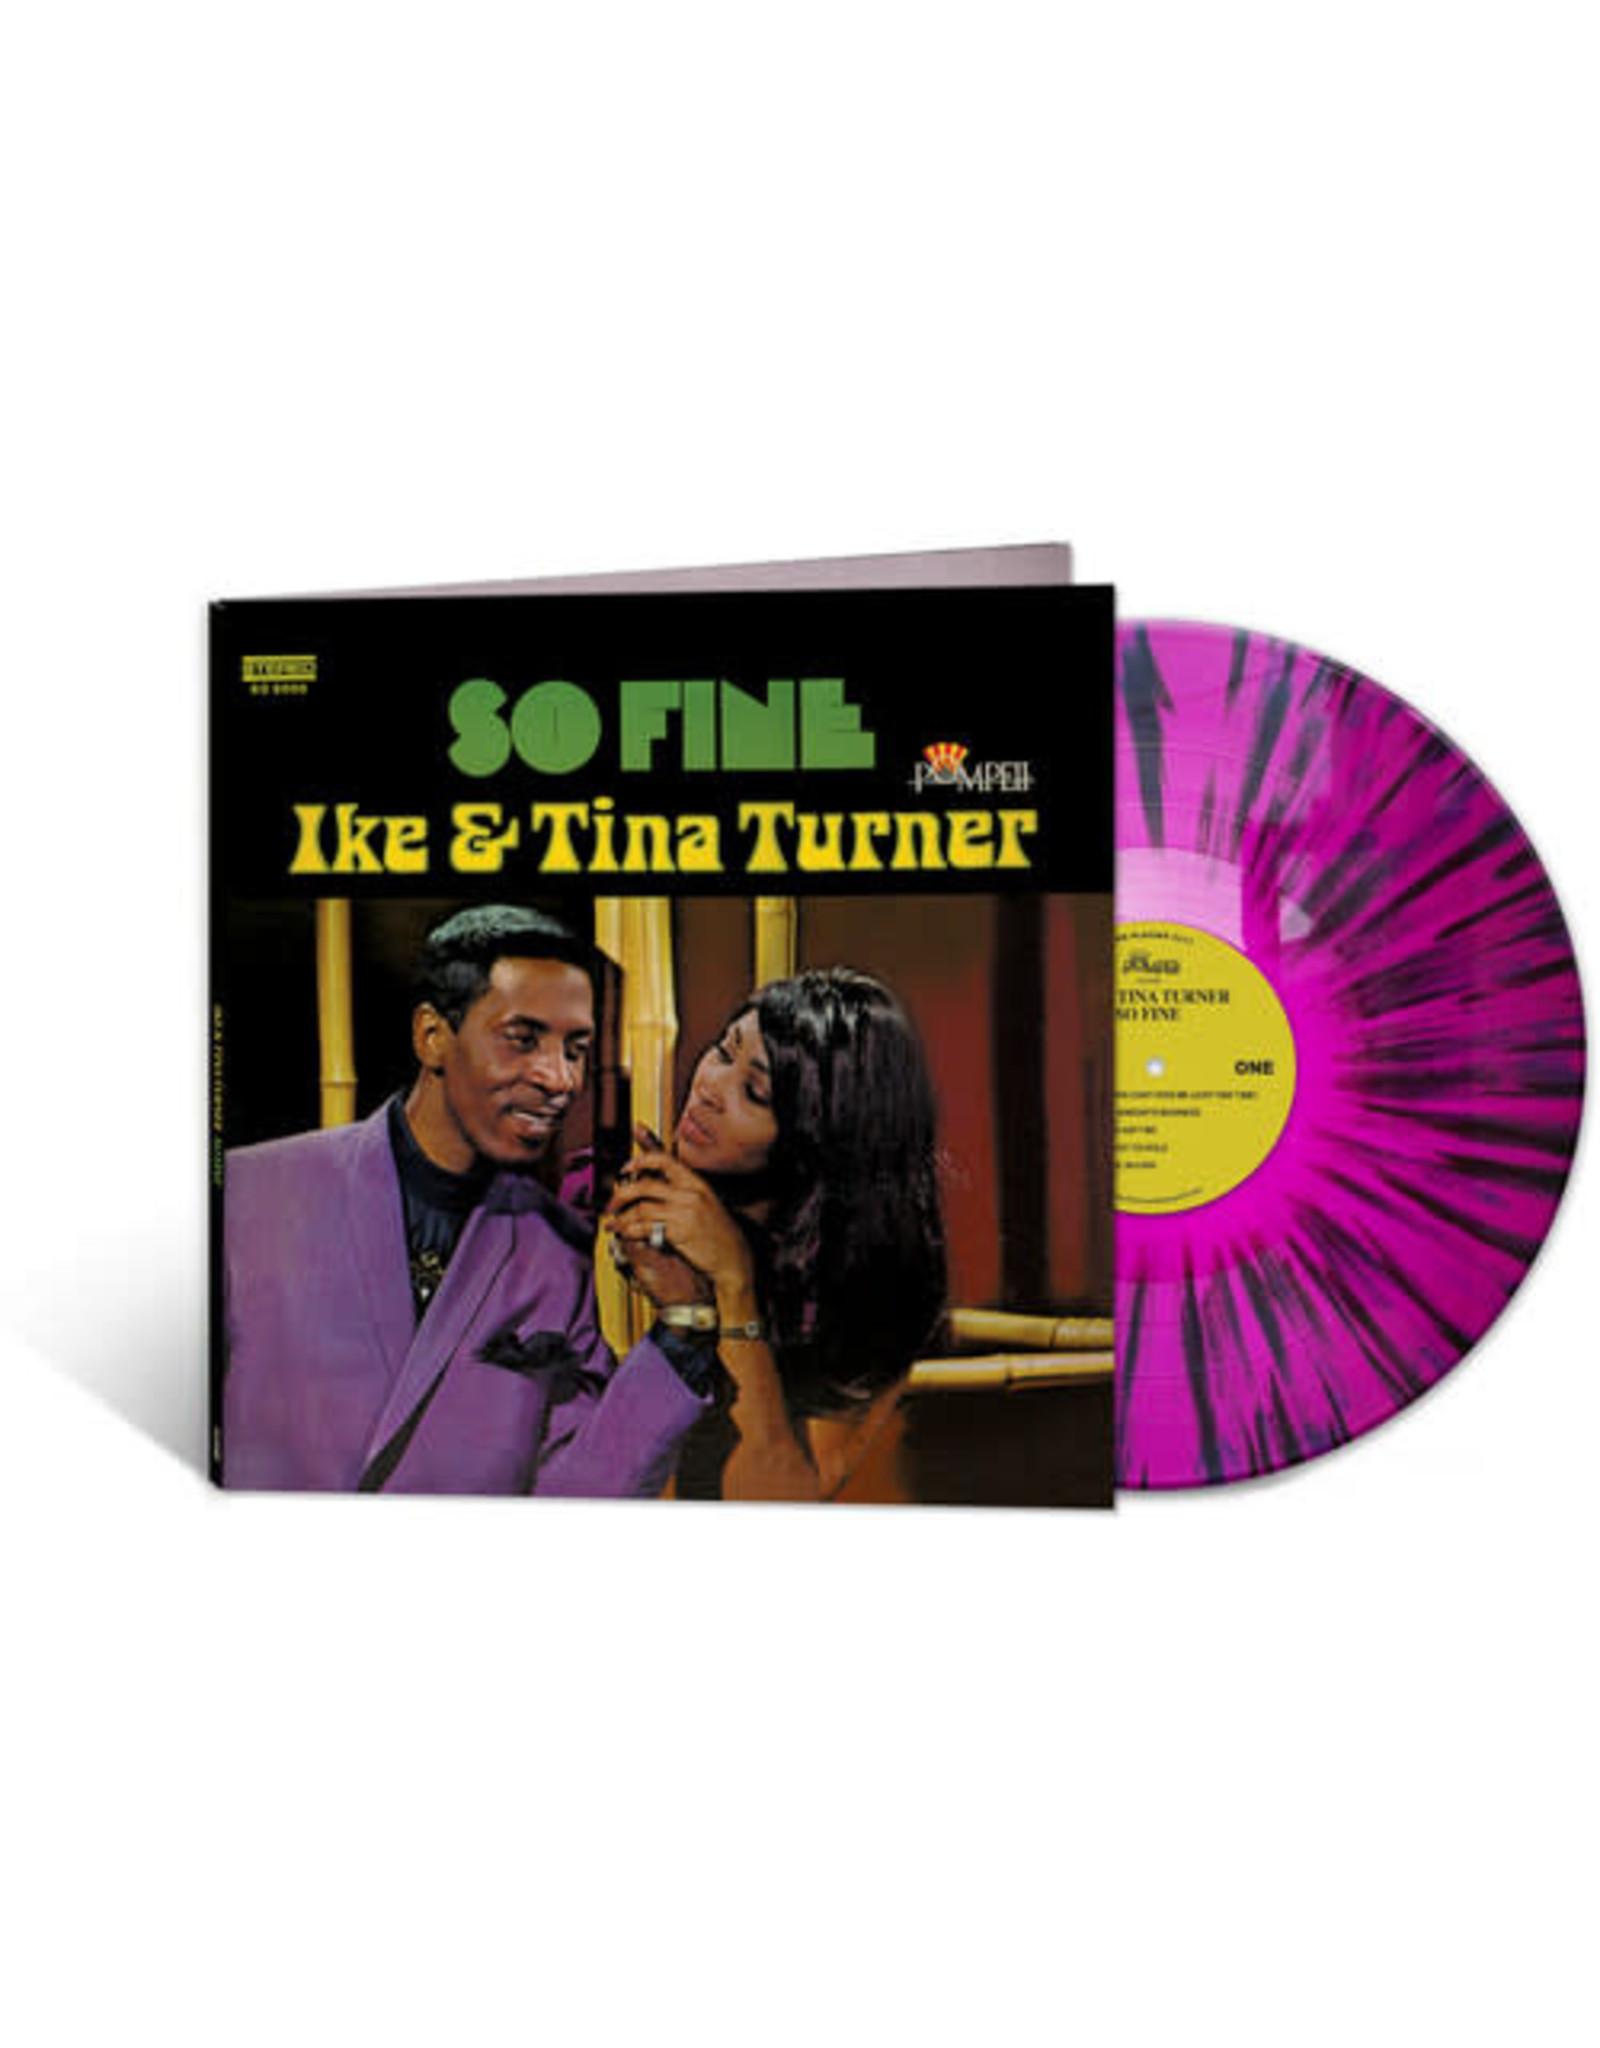 New Vinyl Ike & Tina Turner - So Fine (Colored) LP